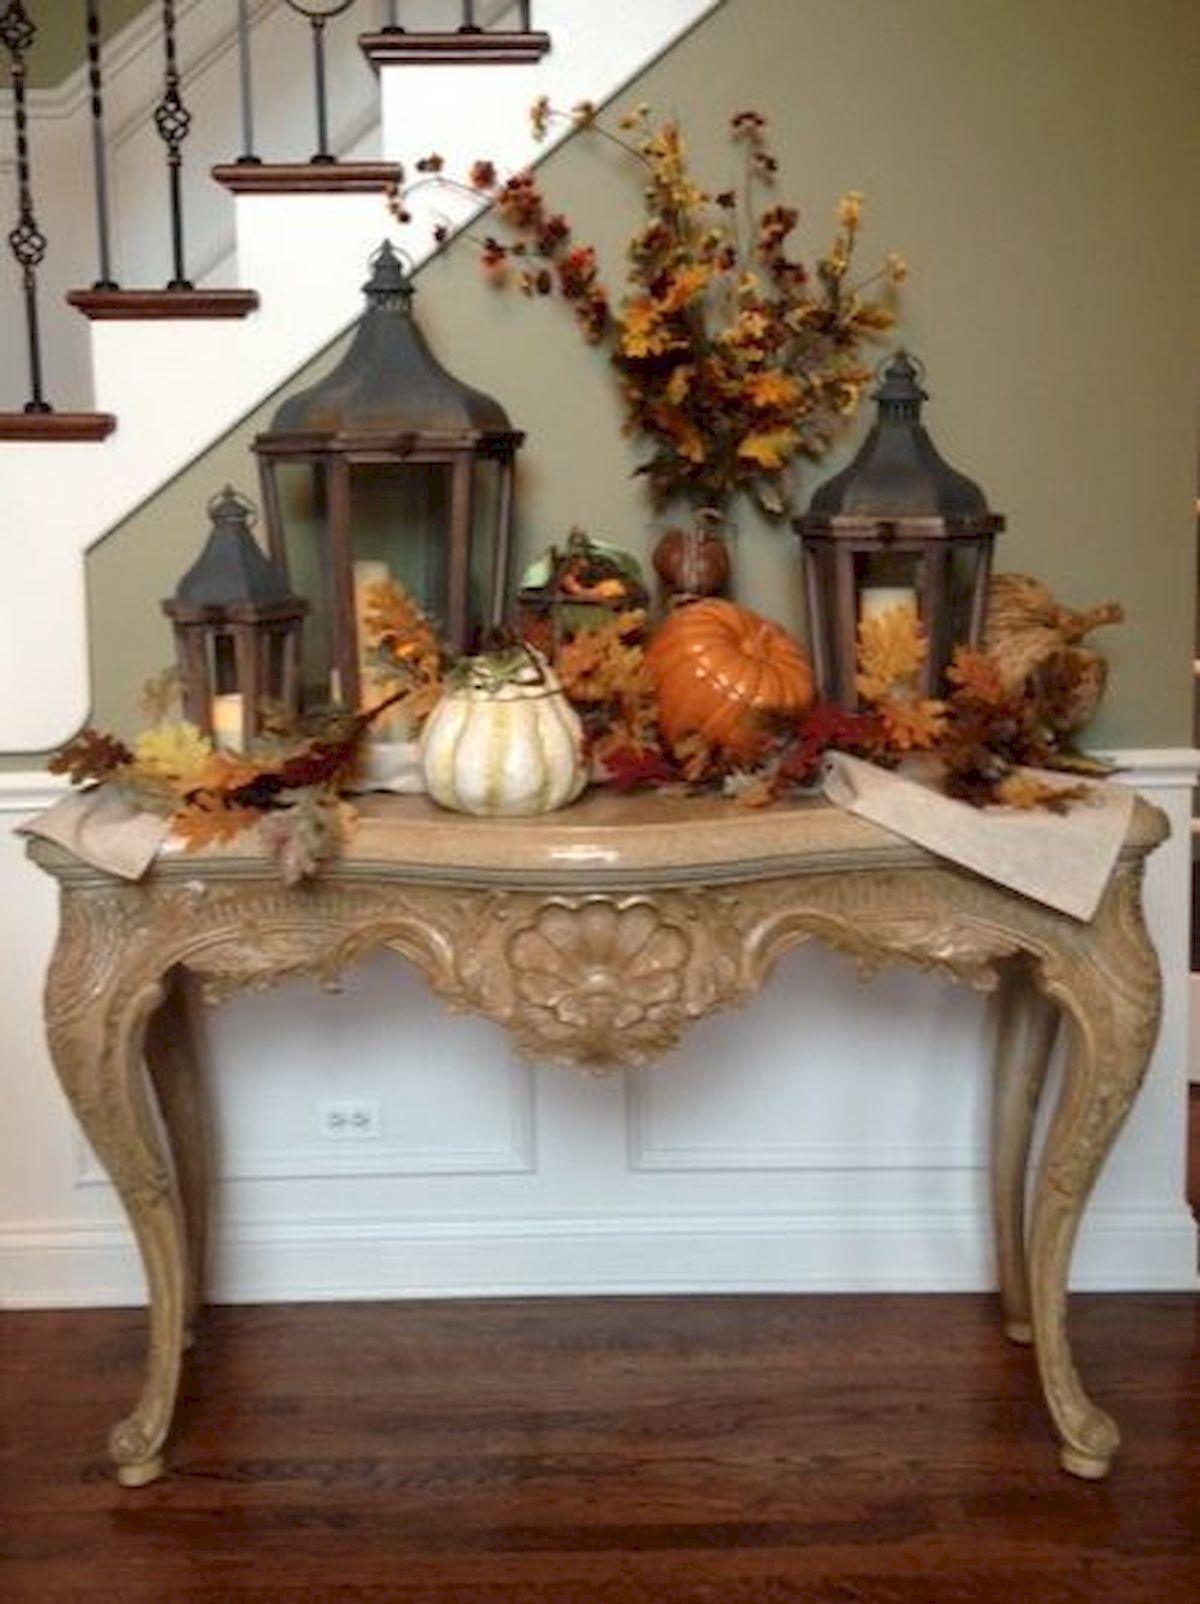 40 Elegant Fall Mantel Decor Ideas  Fall ideas  Fall mantel decorations Fall mantle decor